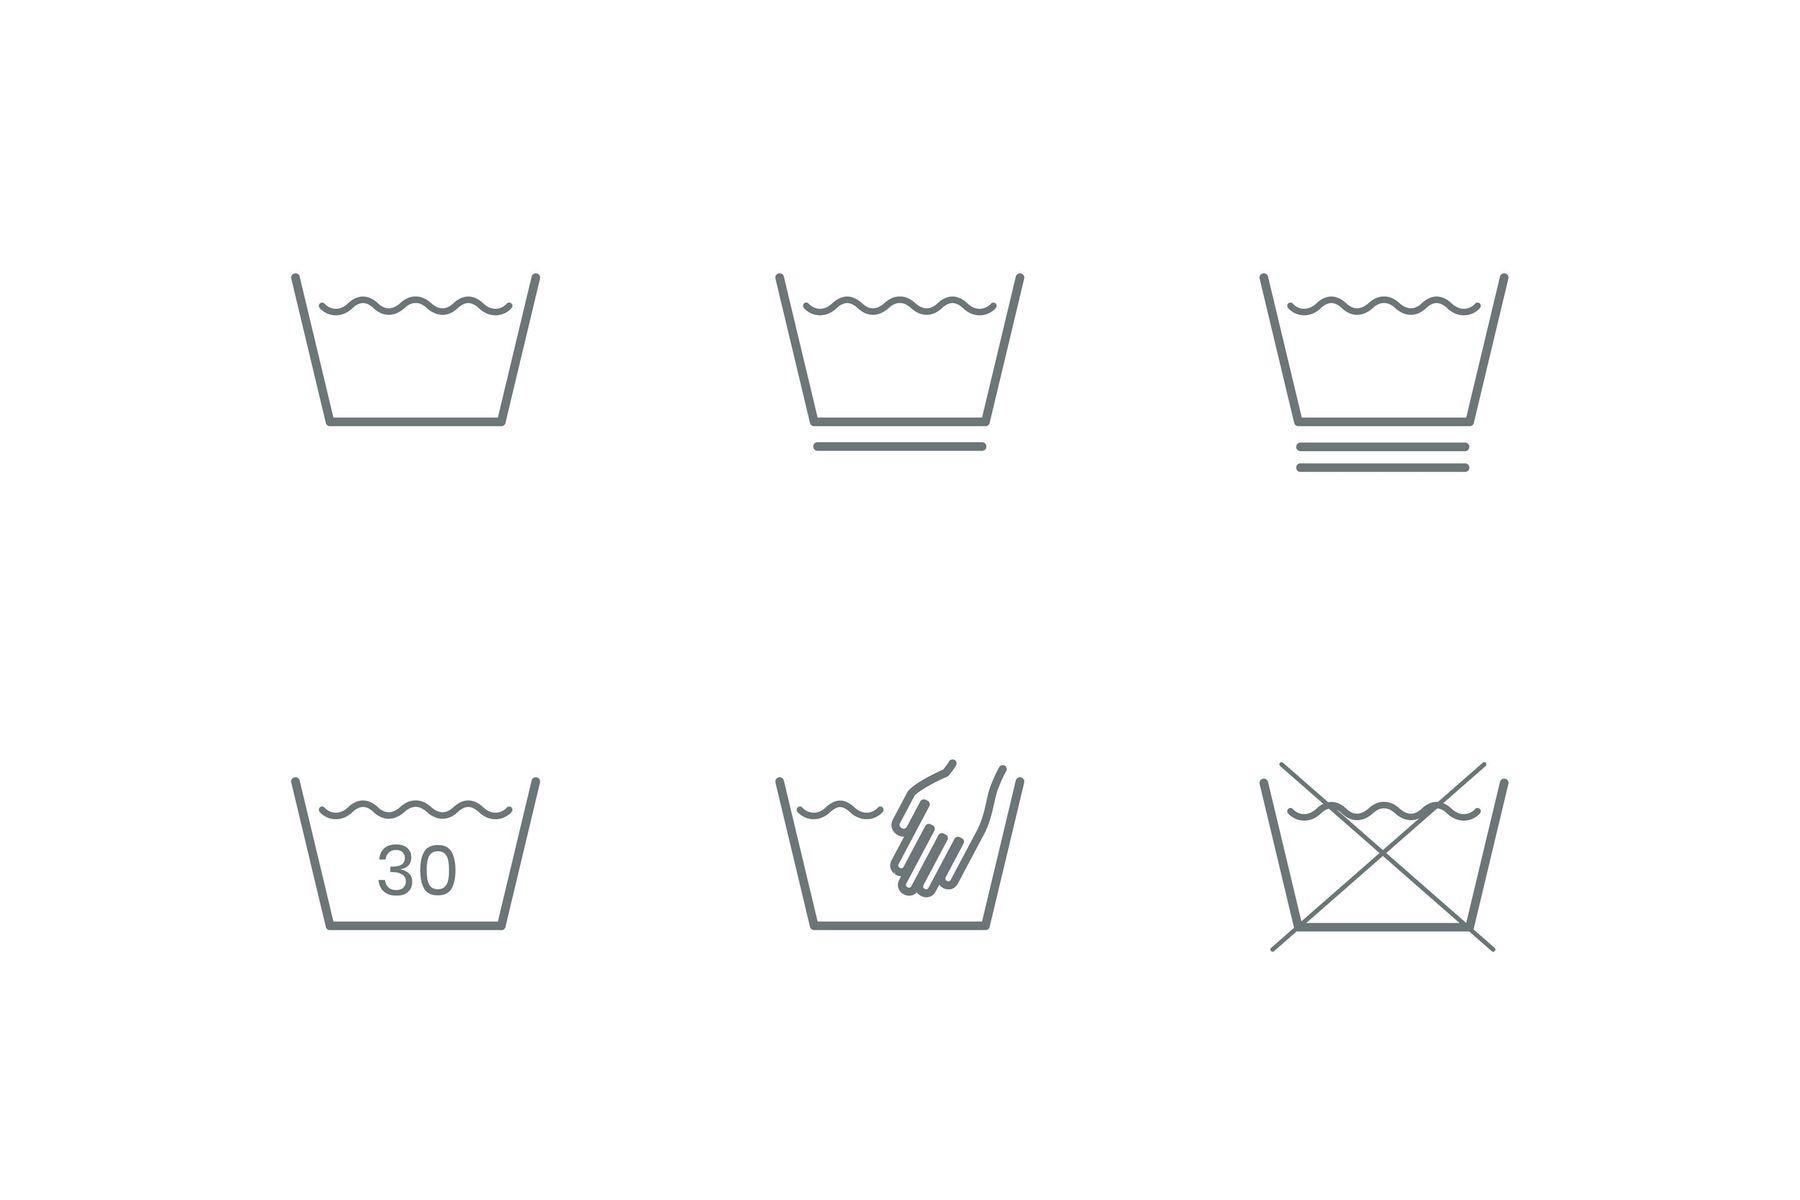 Washing machine symbols